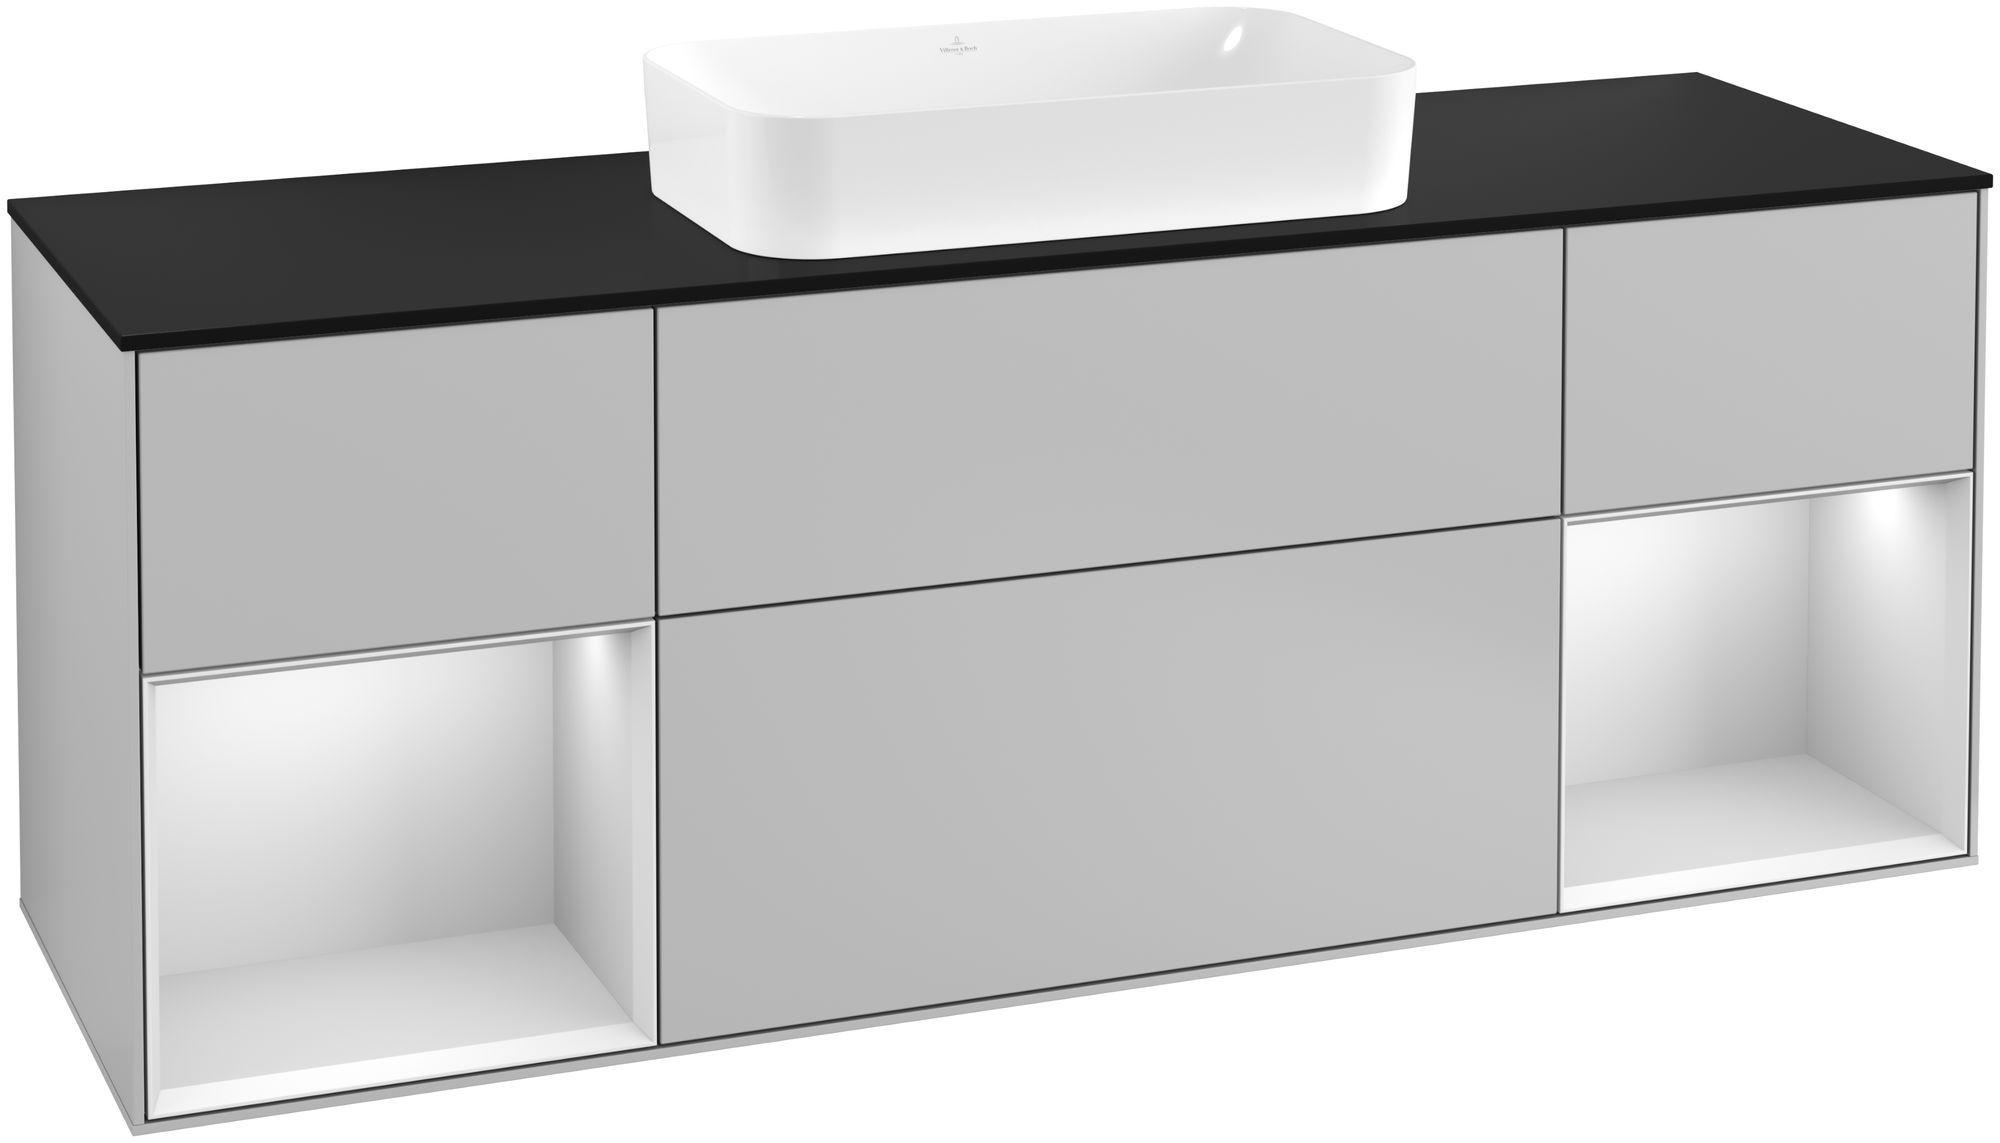 Villeroy & Boch Finion F33 Waschtischunterschrank mit Regalelement 4 Auszüge Waschtisch mittig LED-Beleuchtung B:160xH:60,3xT:50,1cm Front, Korpus: Light Grey Matt, Regal: Weiß Matt Soft Grey, Glasplatte: Black Matt F332MTGJ